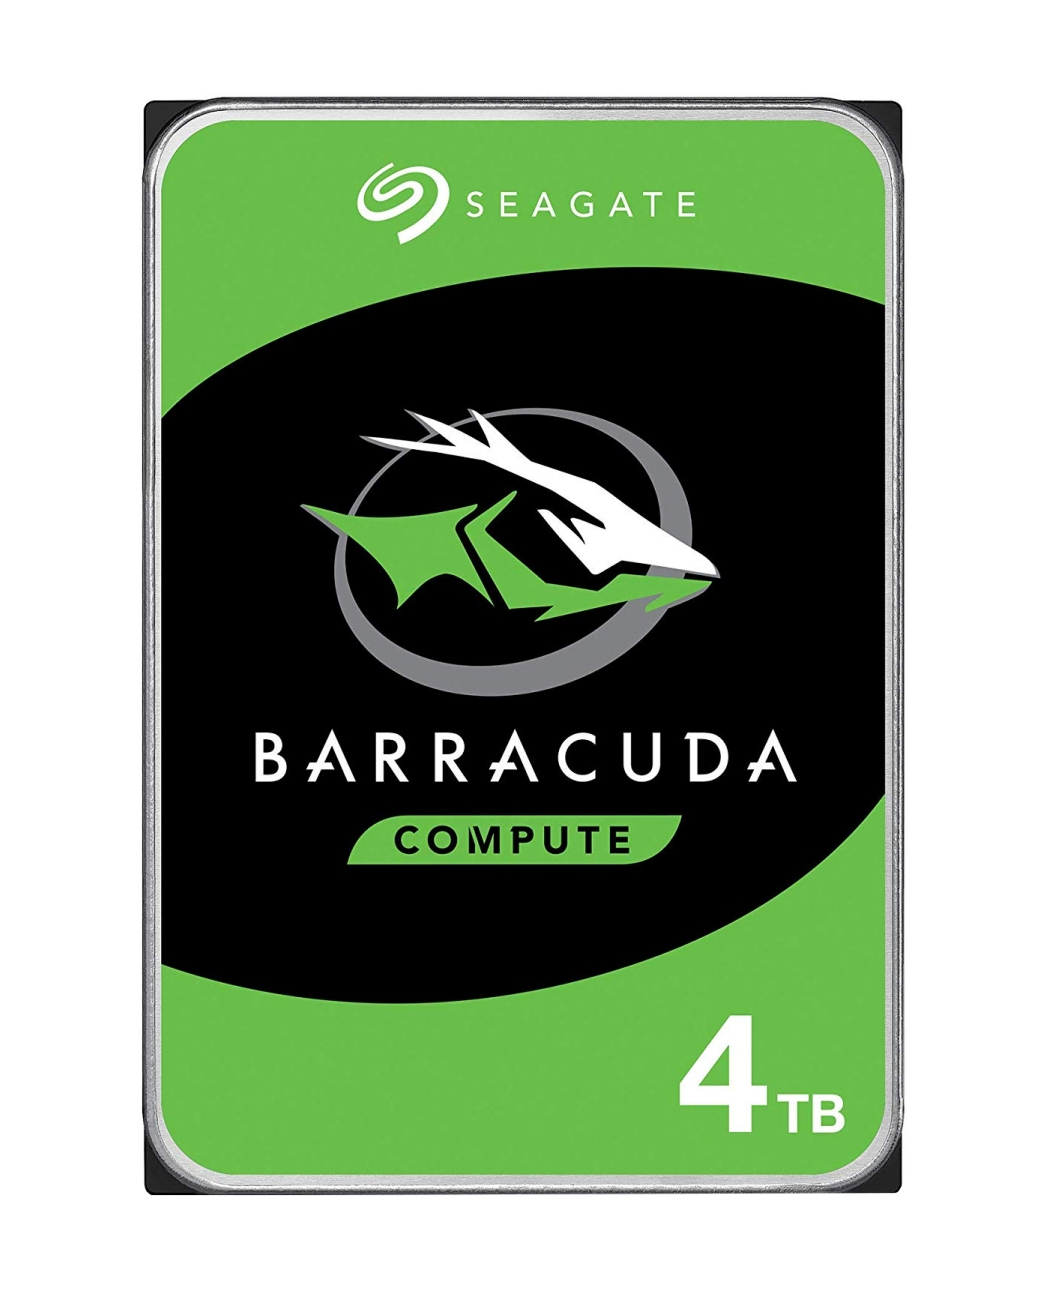 Seagate Barracuda Internal Hard Drive 4TB SATA 6Gb//s 256MB Cache 3.5-Inch ST400